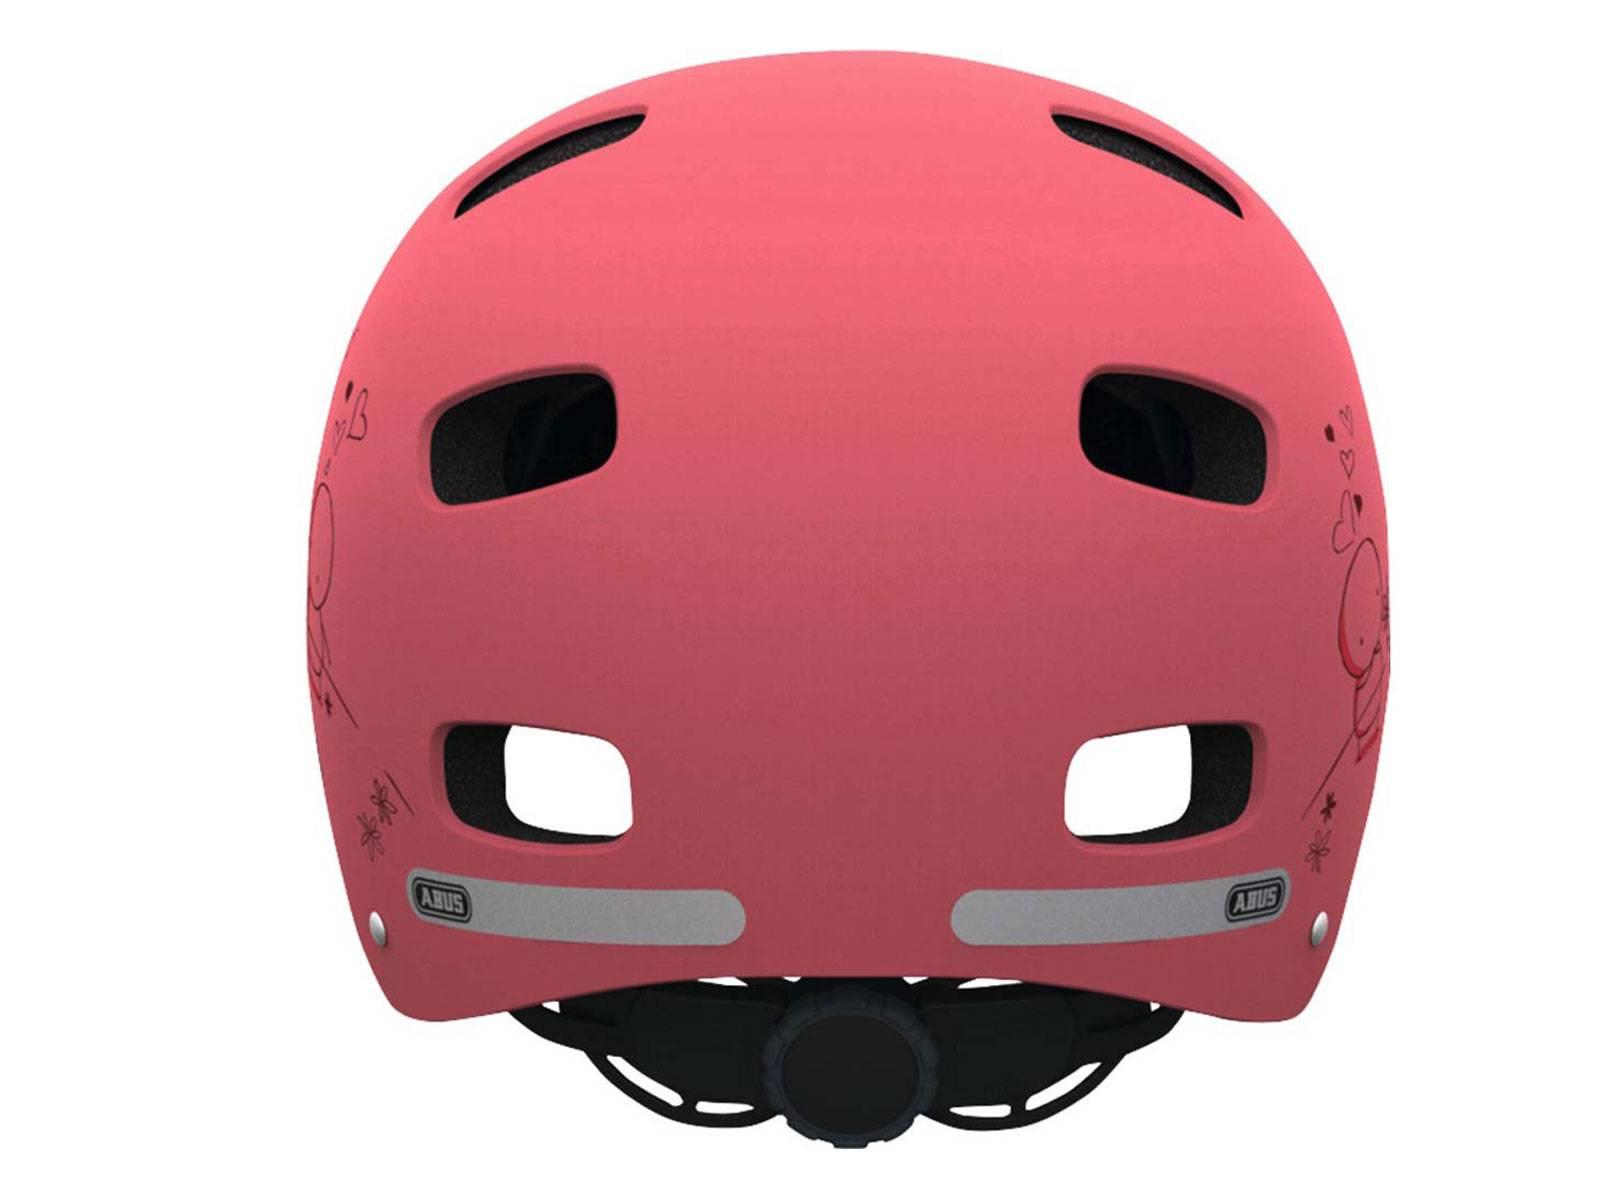 abus fahrradhelm scraper kid 2 0 s rosa fahrradkomfort. Black Bedroom Furniture Sets. Home Design Ideas